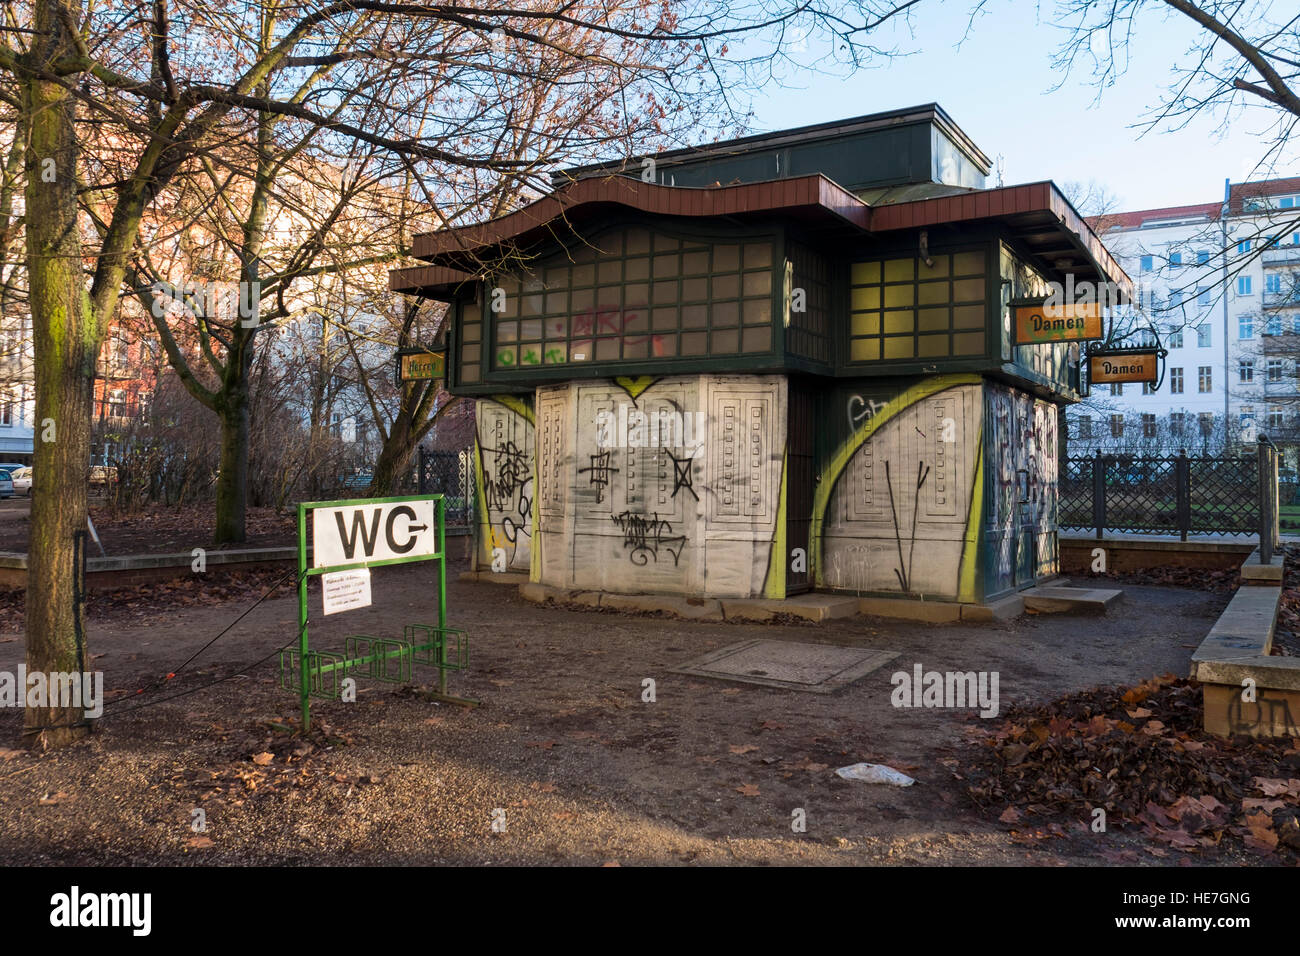 Old Toilet building exterior, public convenience, WC, loo, lavatory in park. Arkonaplatz, Mitte, Berlin - Stock Image